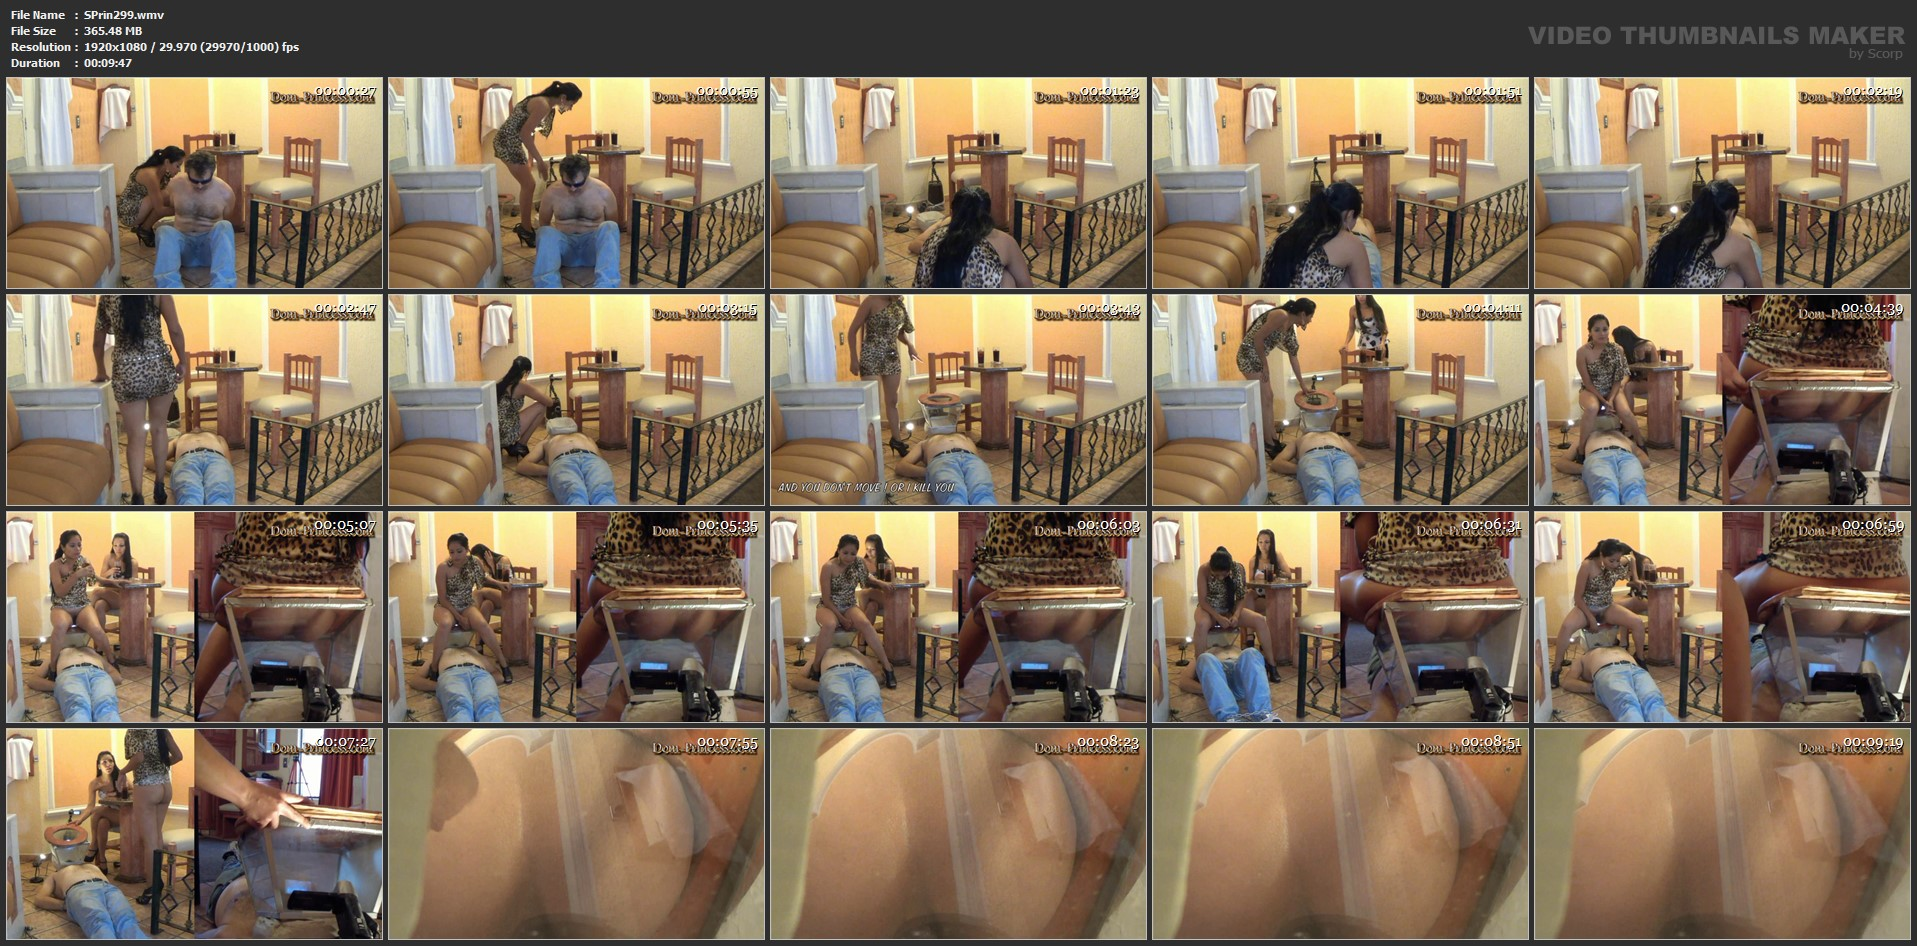 [SCAT-PRINCESS] Stone Mask   Showcase   Girl Part 08 Gabi [FULL HD][1080p][WMV]